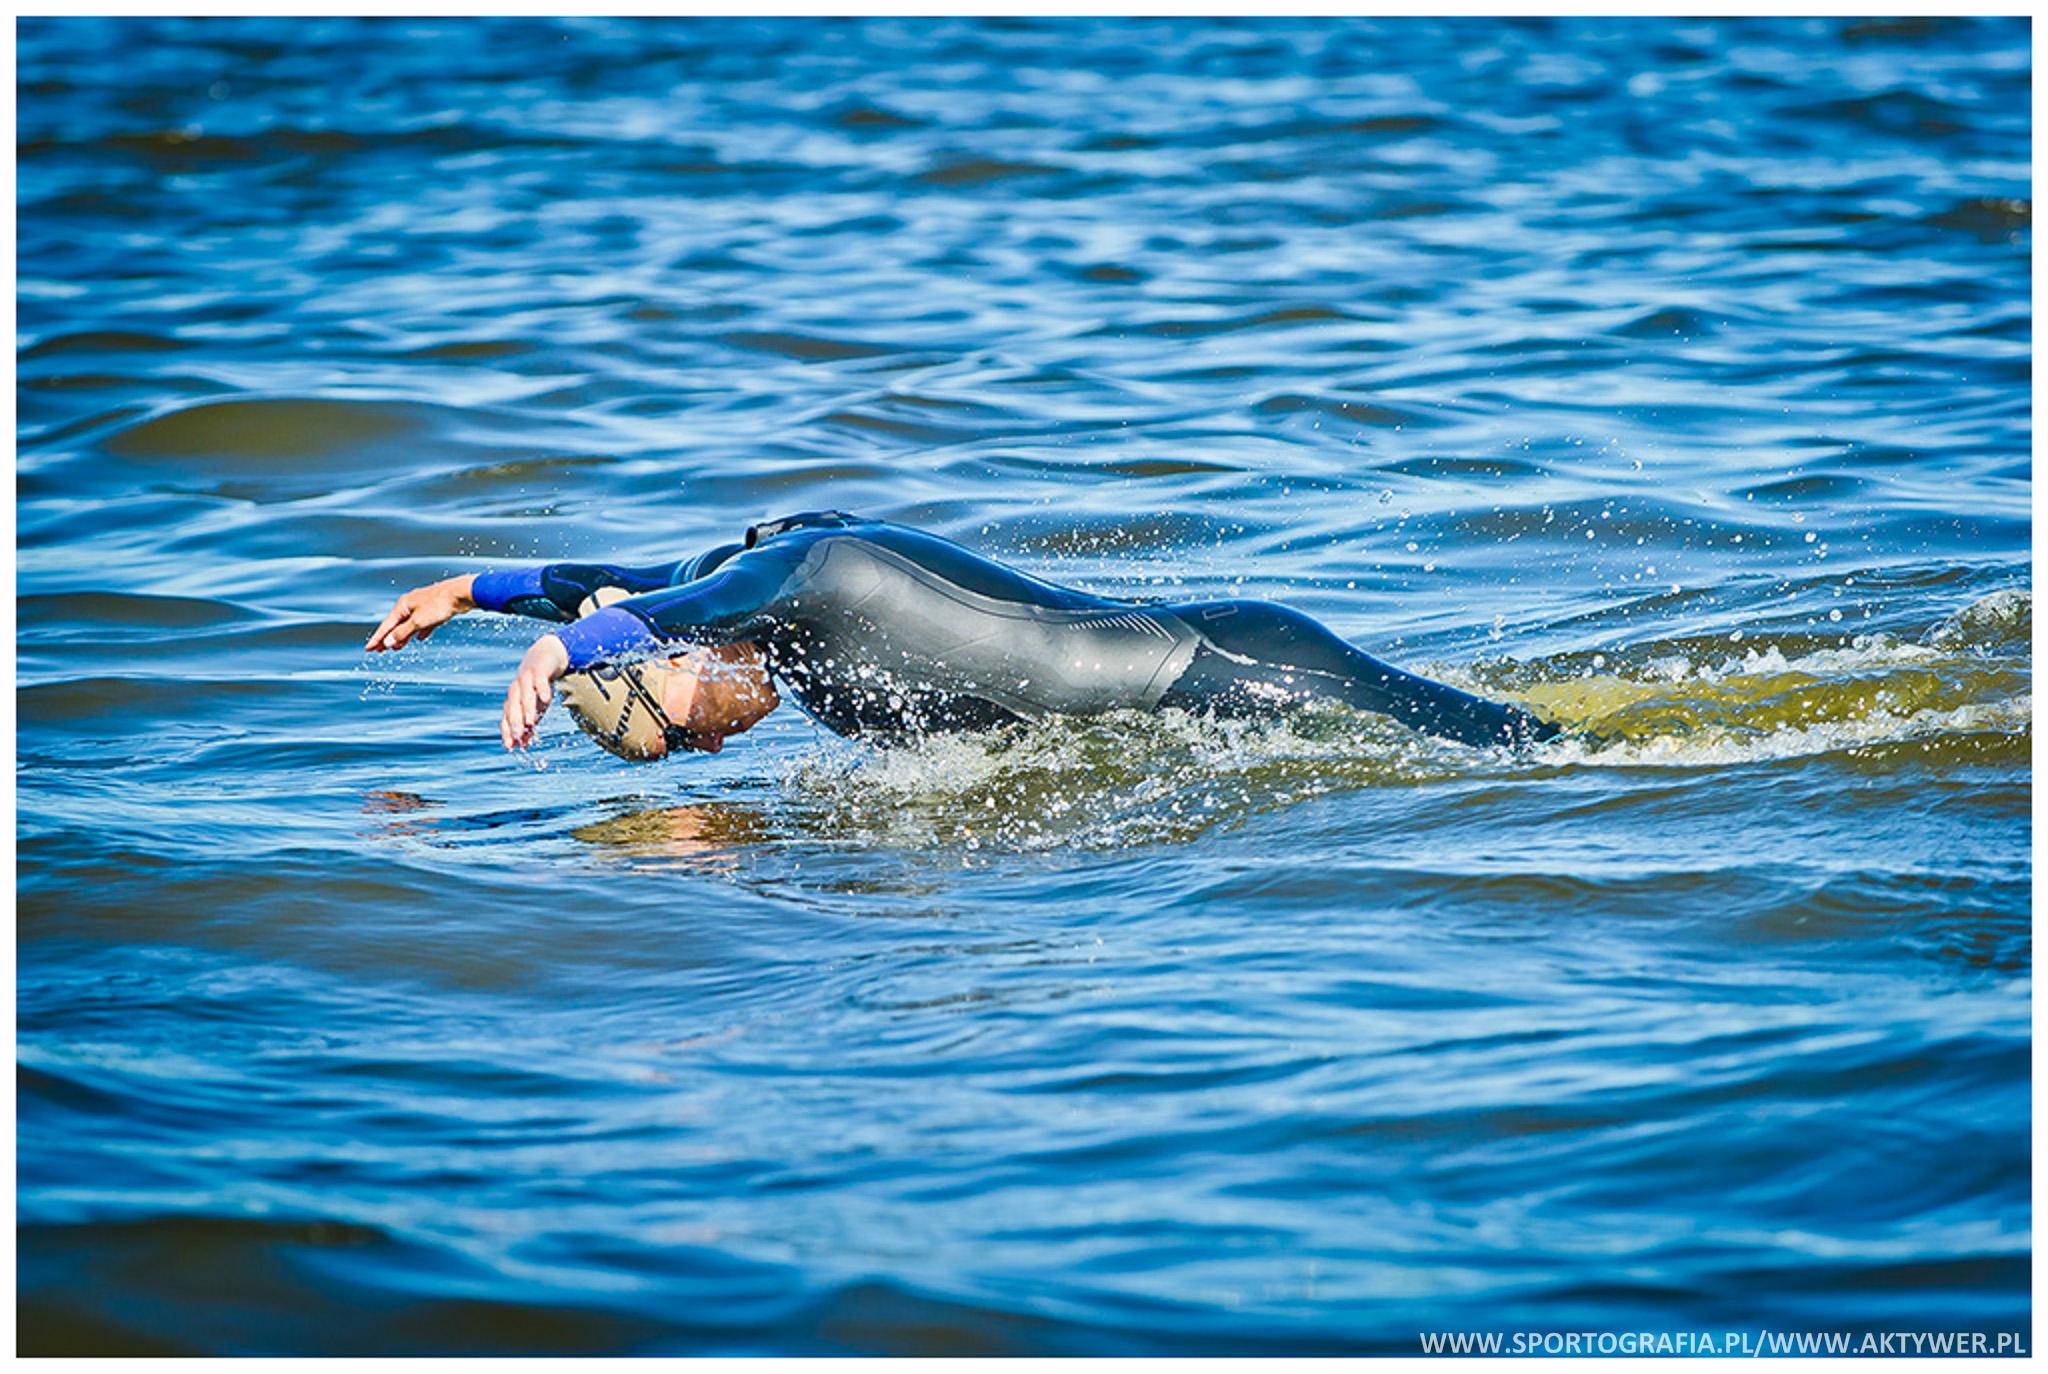 Enea 5150 Warsaw Triathlon, 11.06.2017 Warszawa